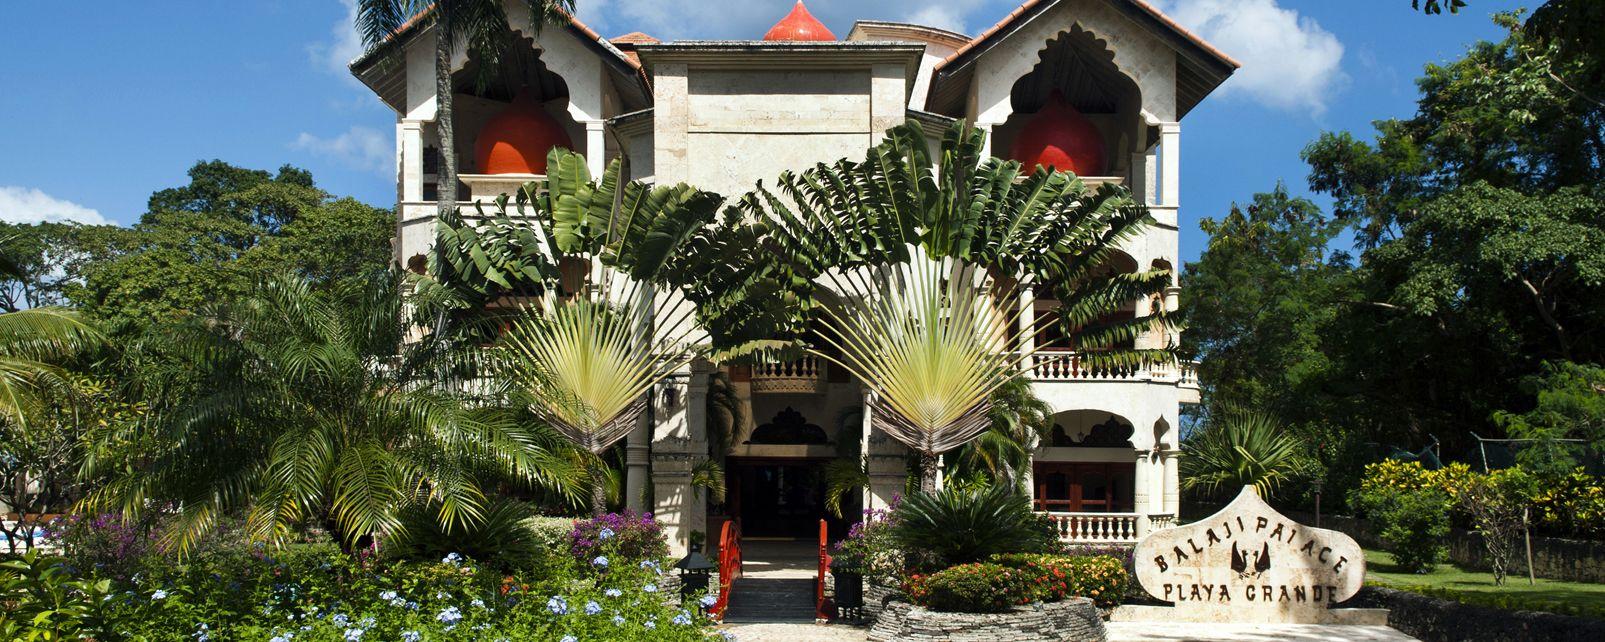 Hôtel Balaji Palace Playa Grande